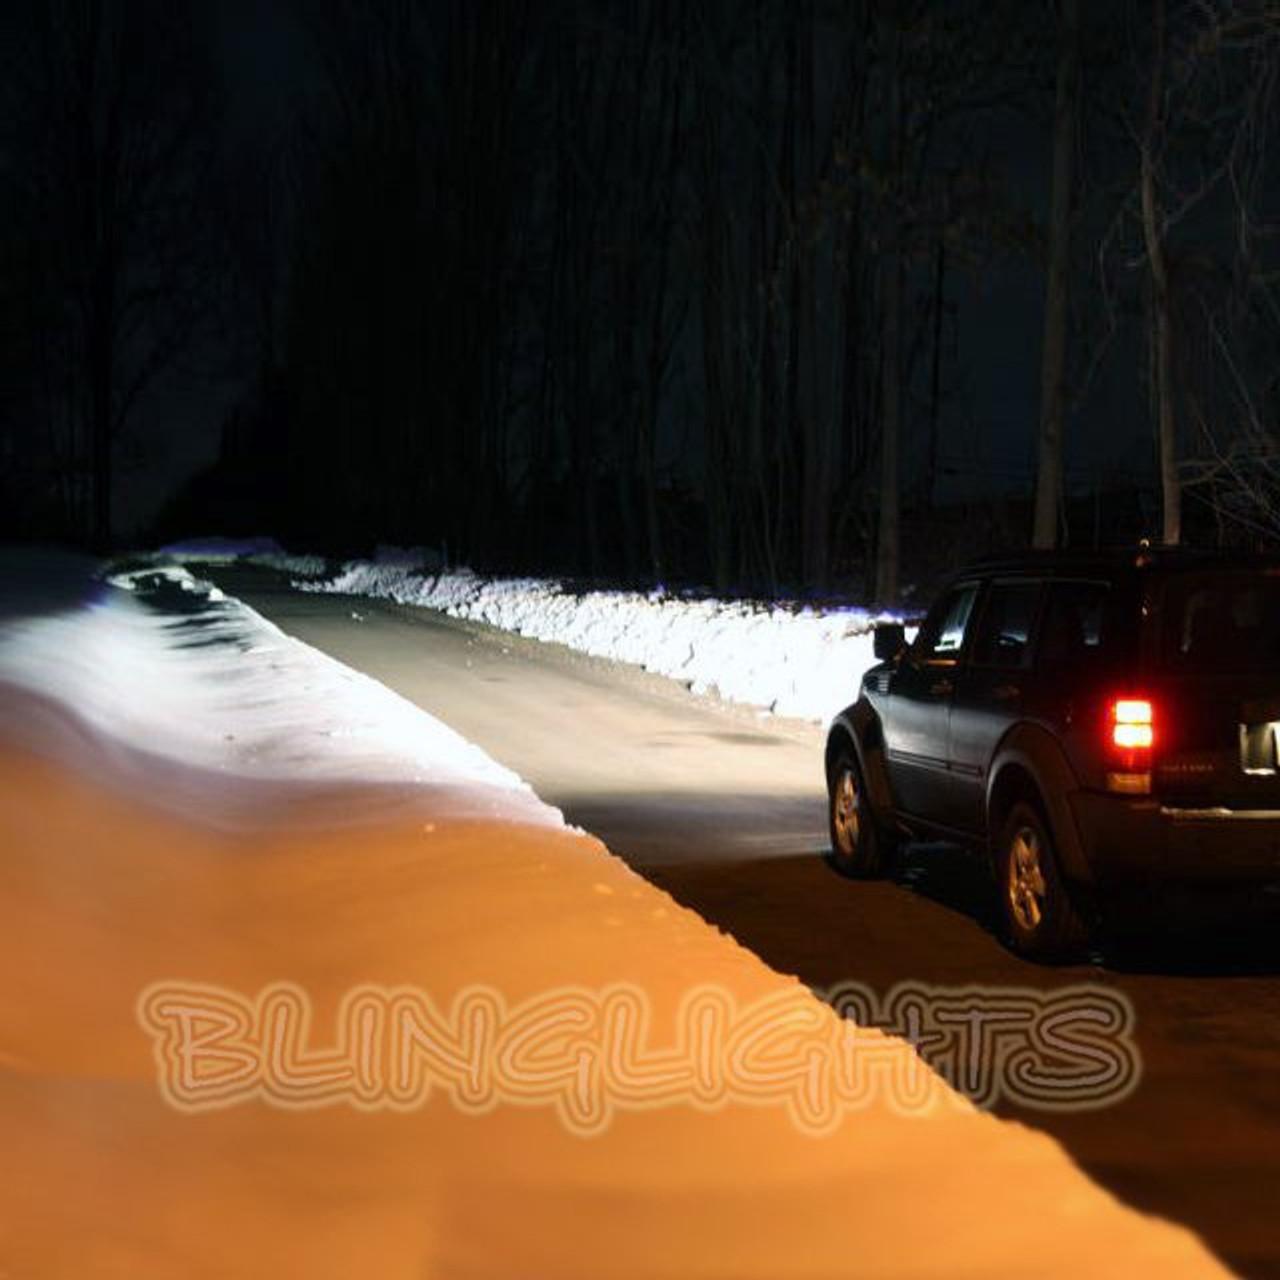 2007 2008 2009 2010 2011 Dodge Nitro Xenon HID Headlamps Headlights Head Lamps Lights Conversion Kit